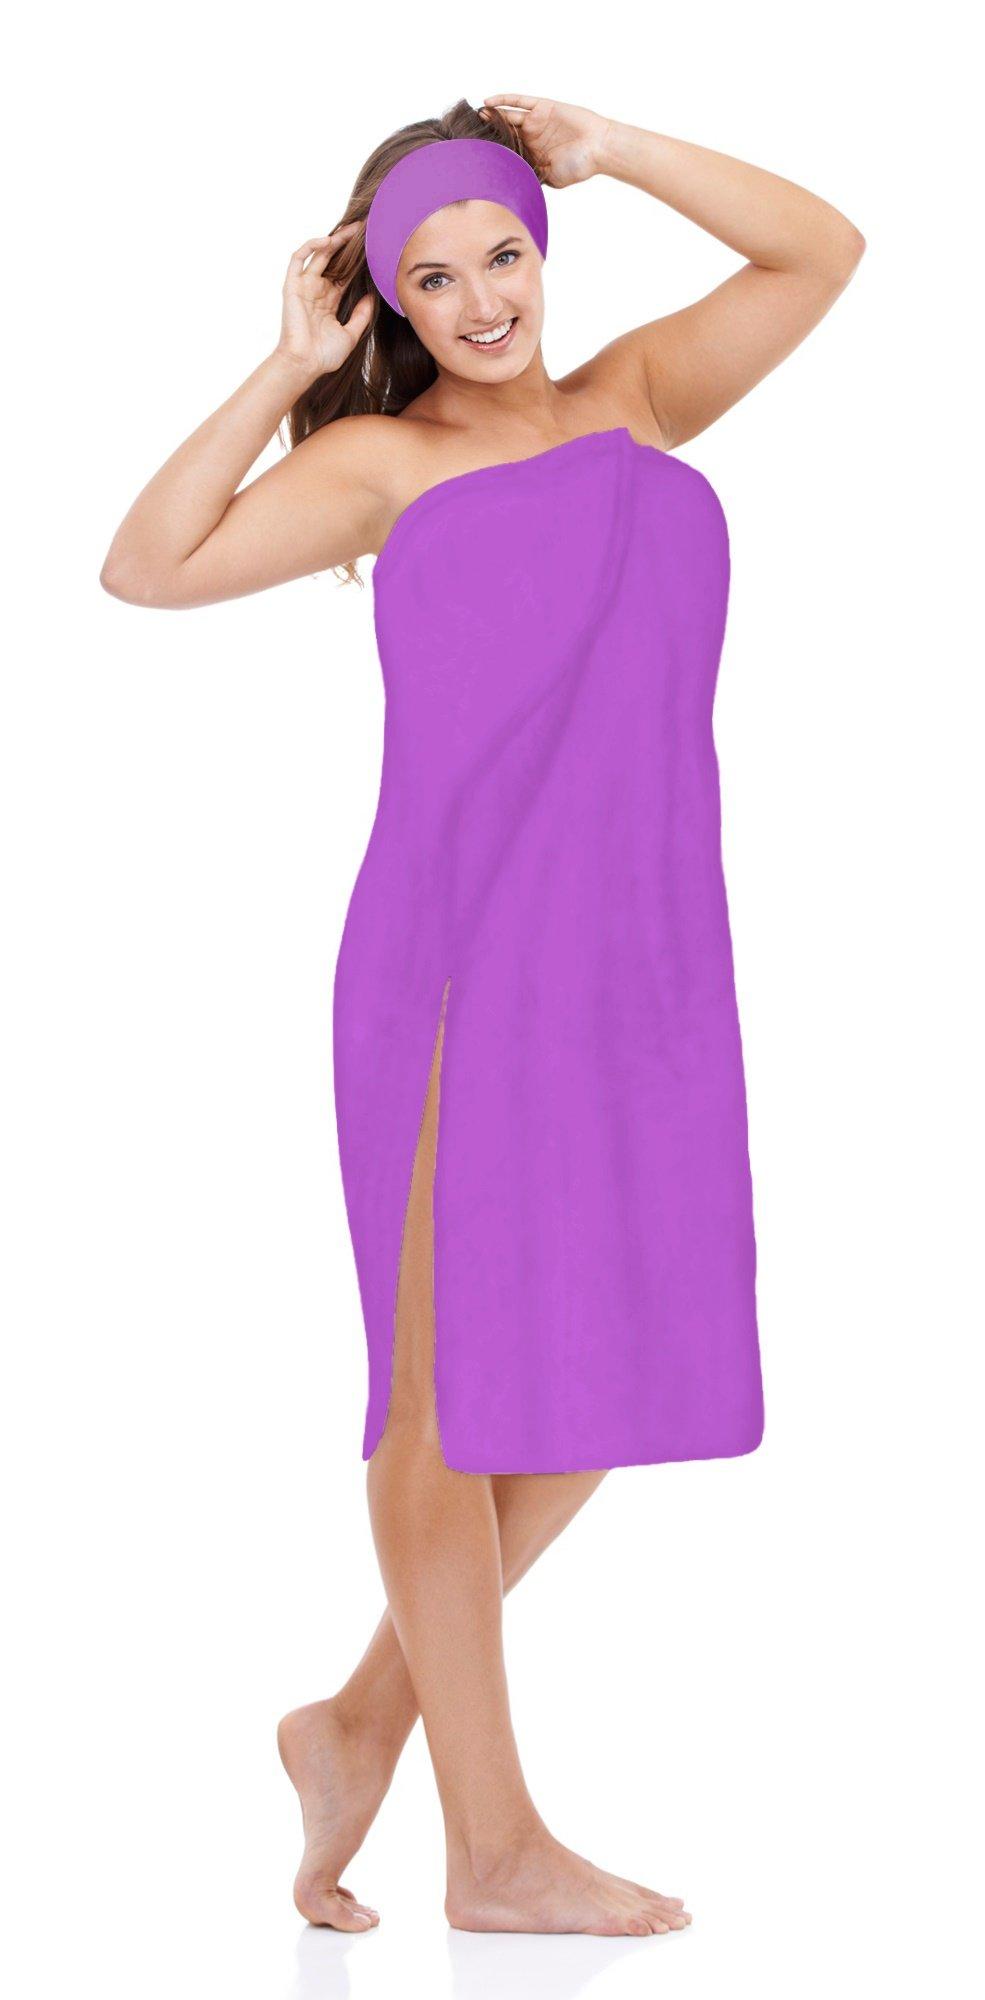 Luxury Spa Wrap Womens Plus Size Snap Bath Towel Wrap (4XL Plus Size 3X 4X, Purple)